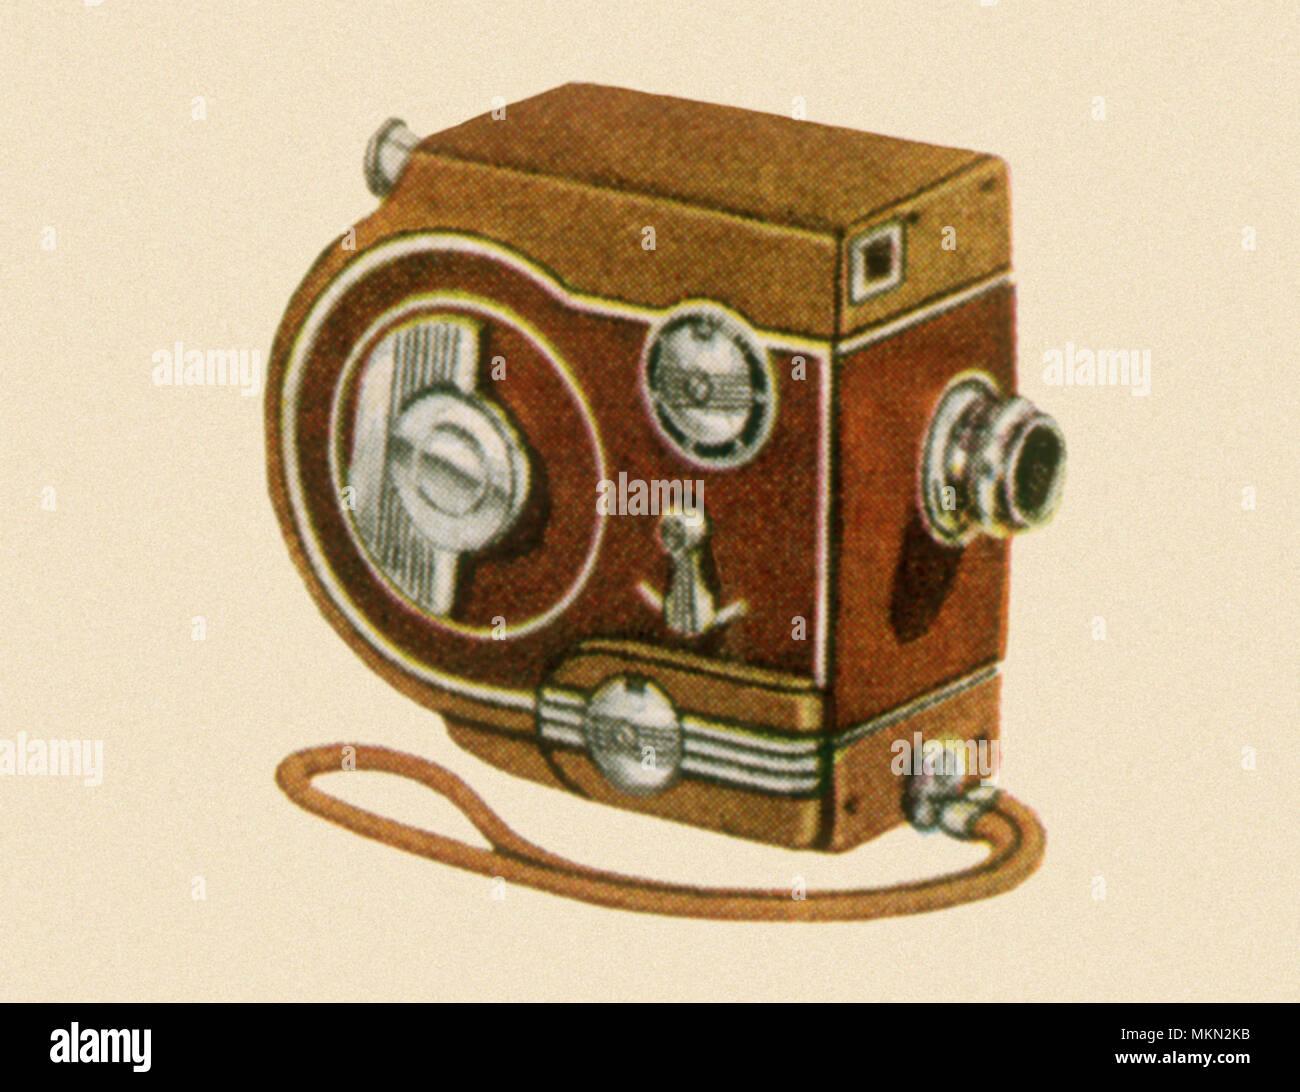 8mm Film Stock Photos & 8mm Film Stock Images - Alamy